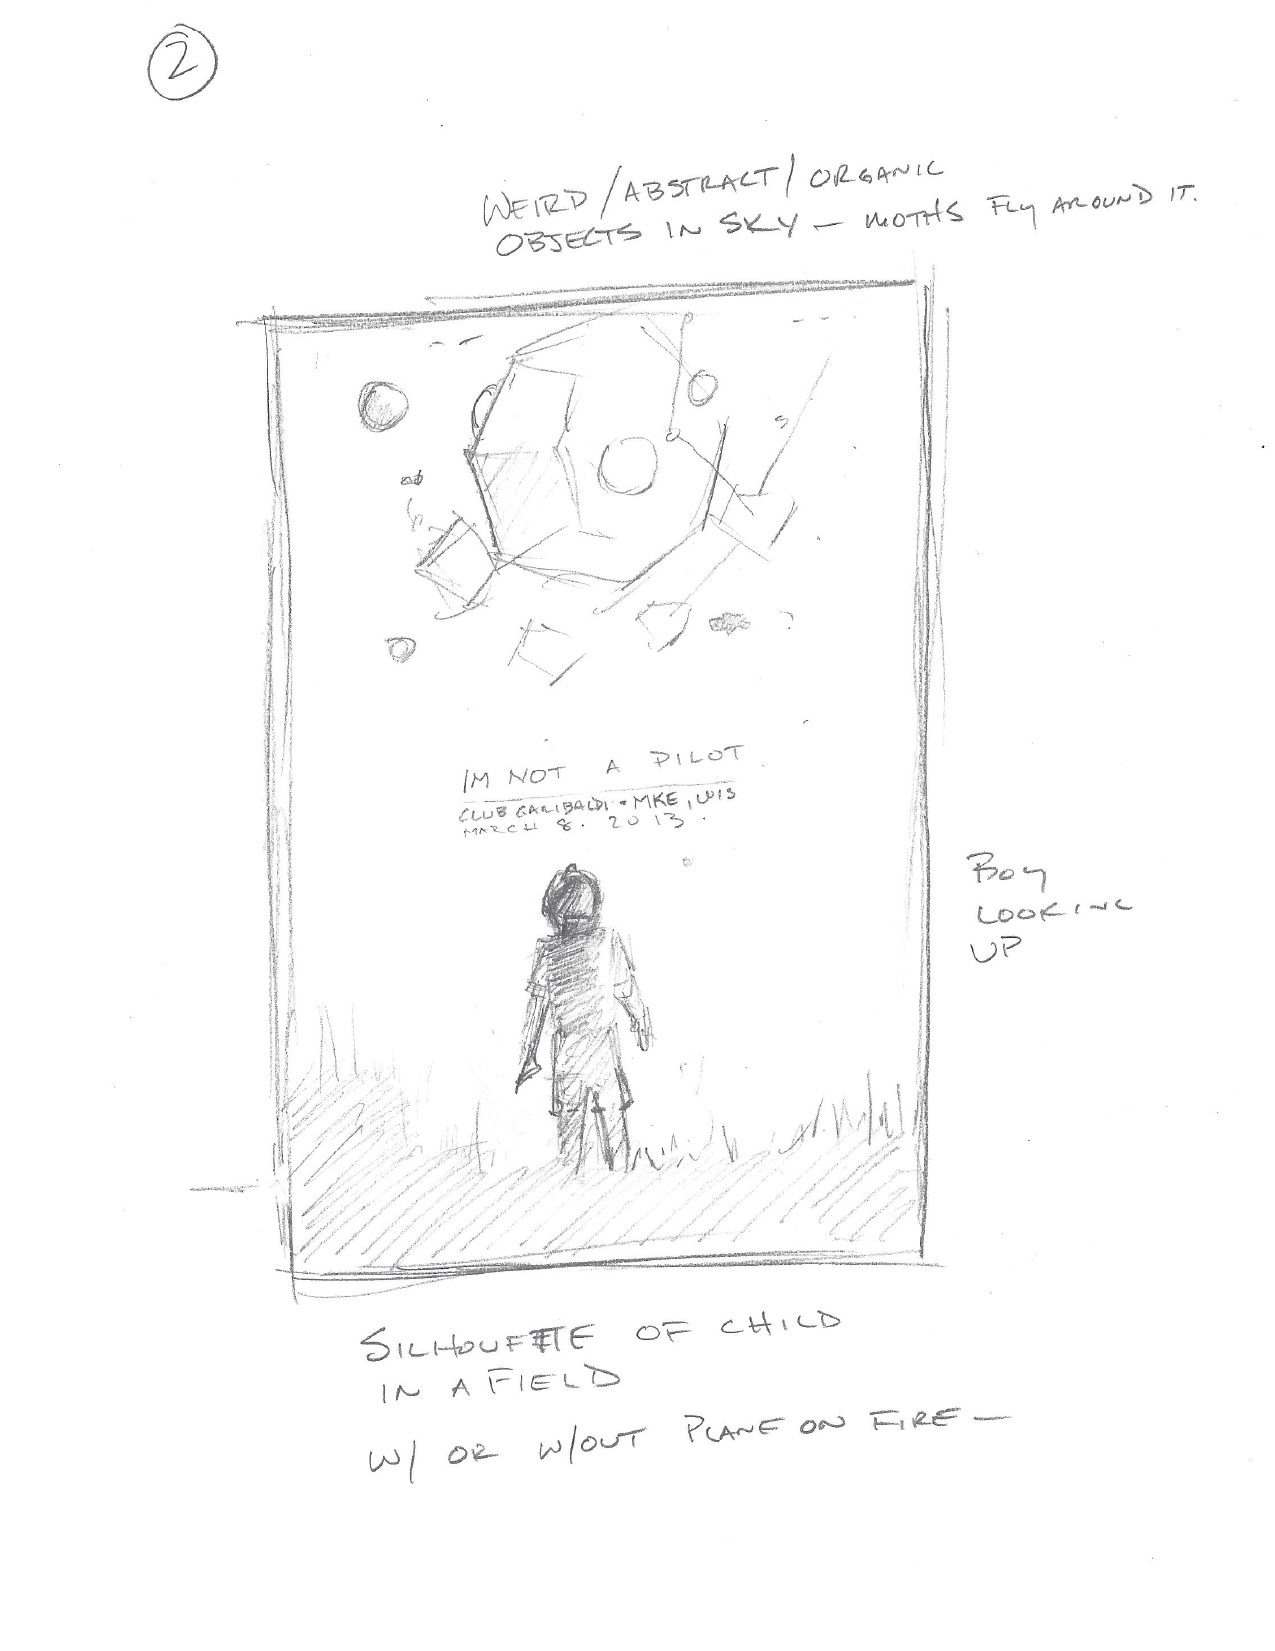 I'm Not a Pilot - Commemorative Show Poster - image 18 - student project